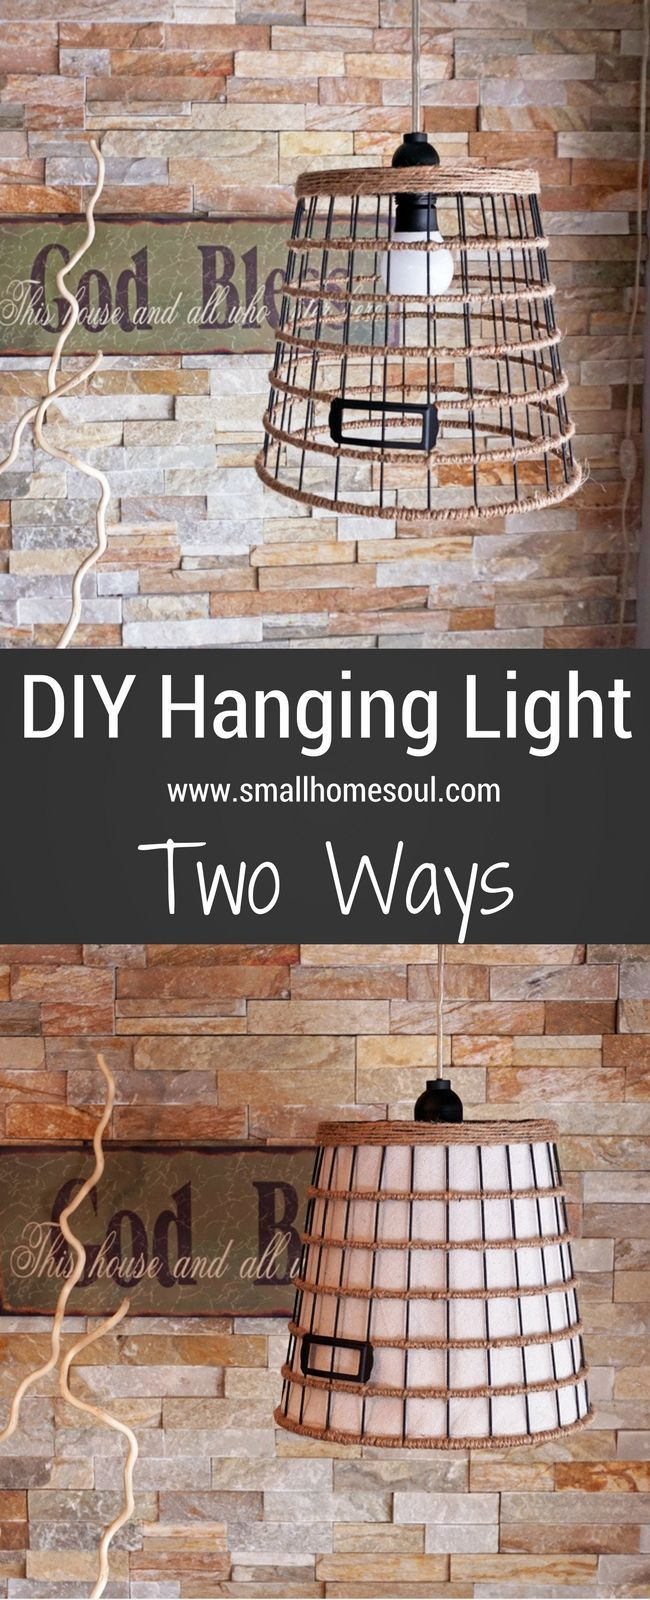 design your own lighting.  own diy hanging light from a wire basket and design your own lighting